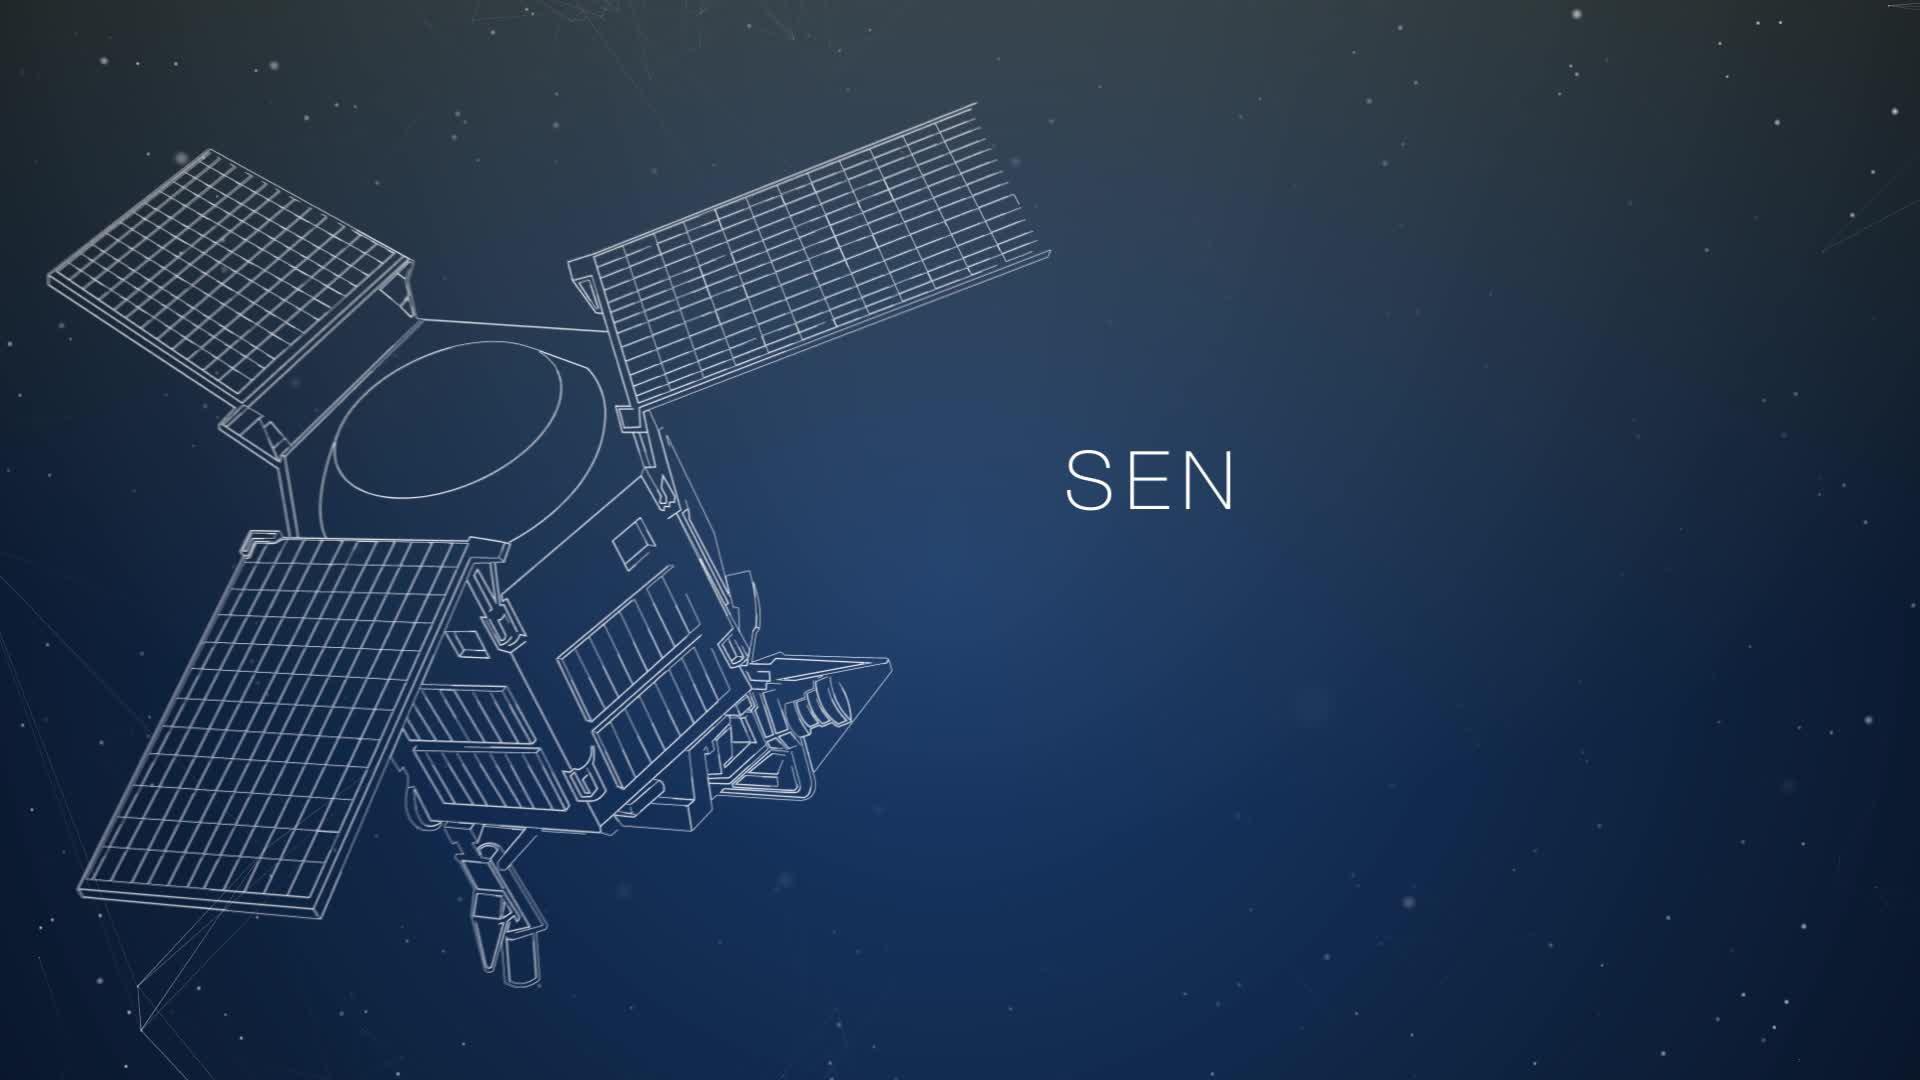 Sentinel-5 Precursor